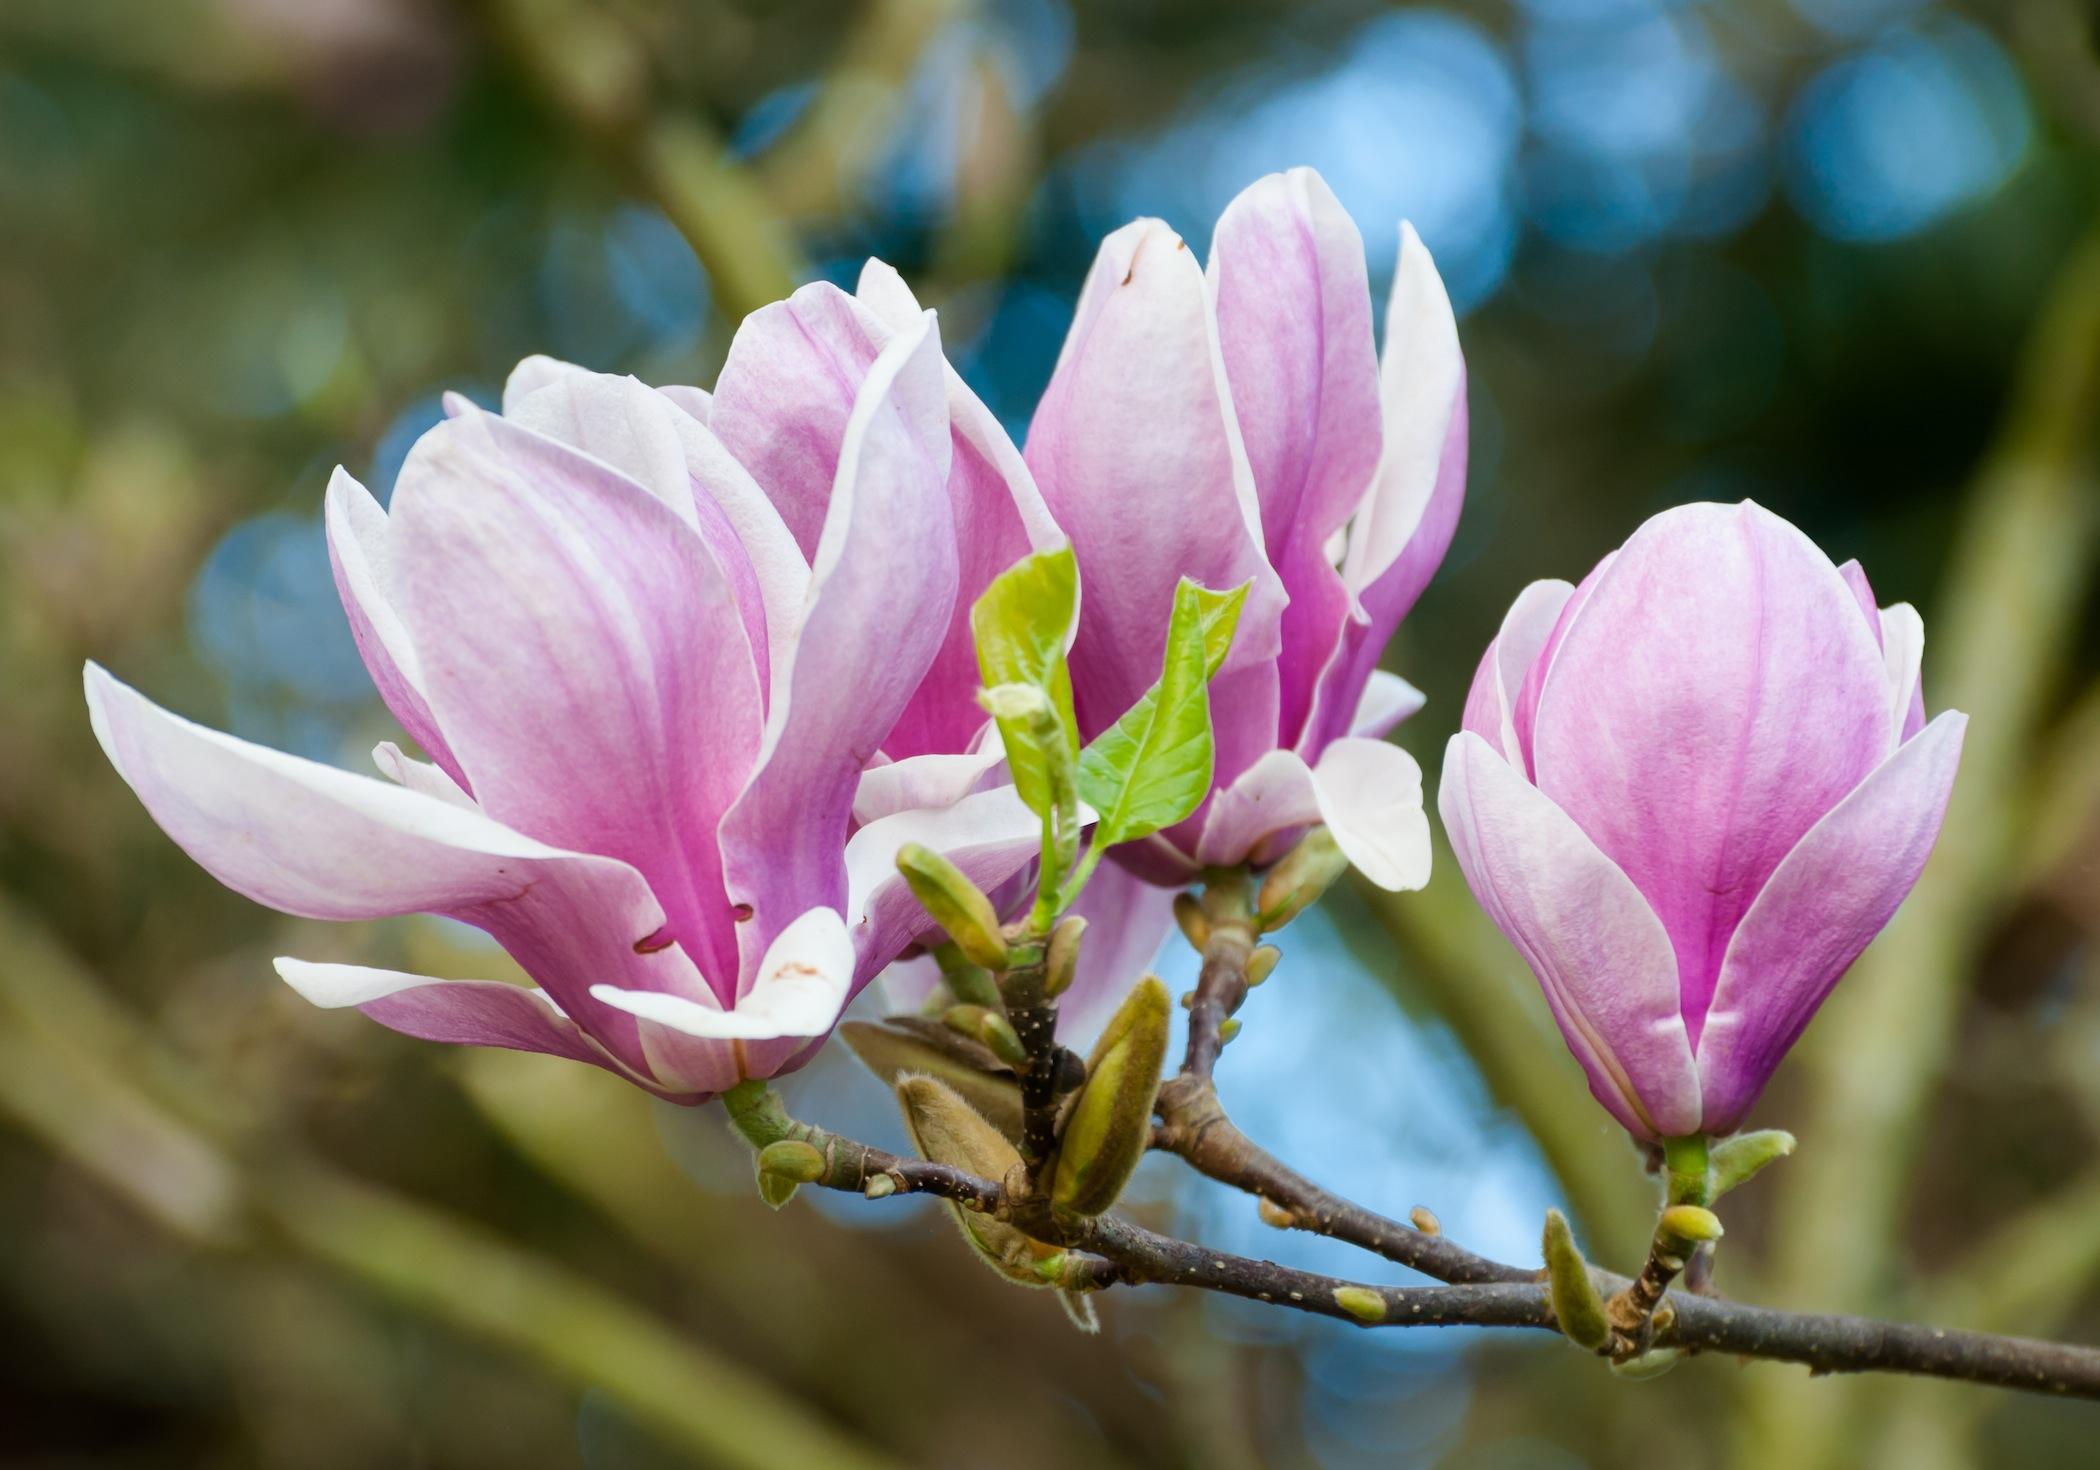 Magnolia x veitchii. Brian Fitzgerald